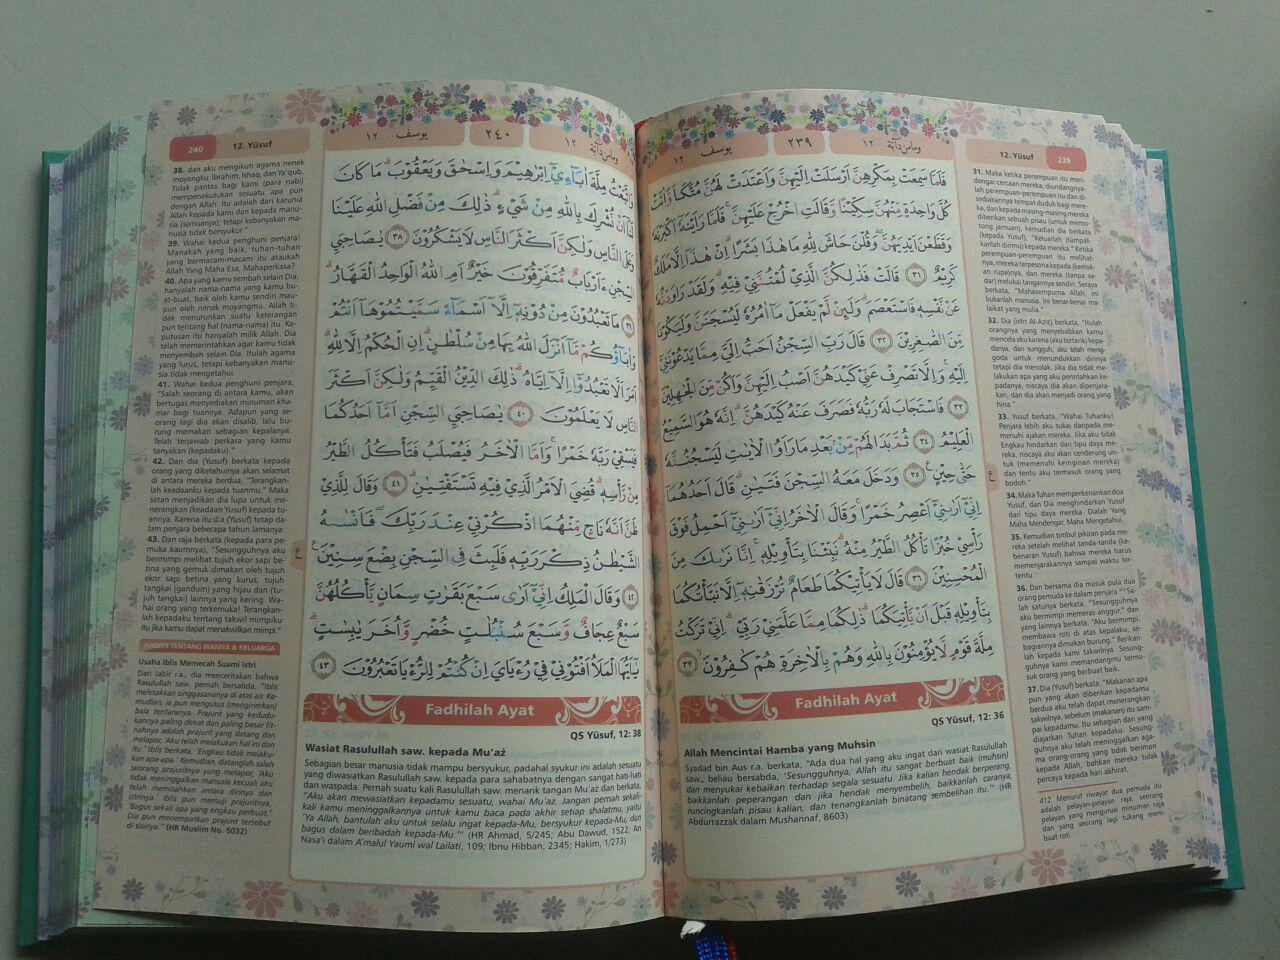 Al-Qur'an Mushaf & Terjemah Yasmina Ukuran B6 isi 2